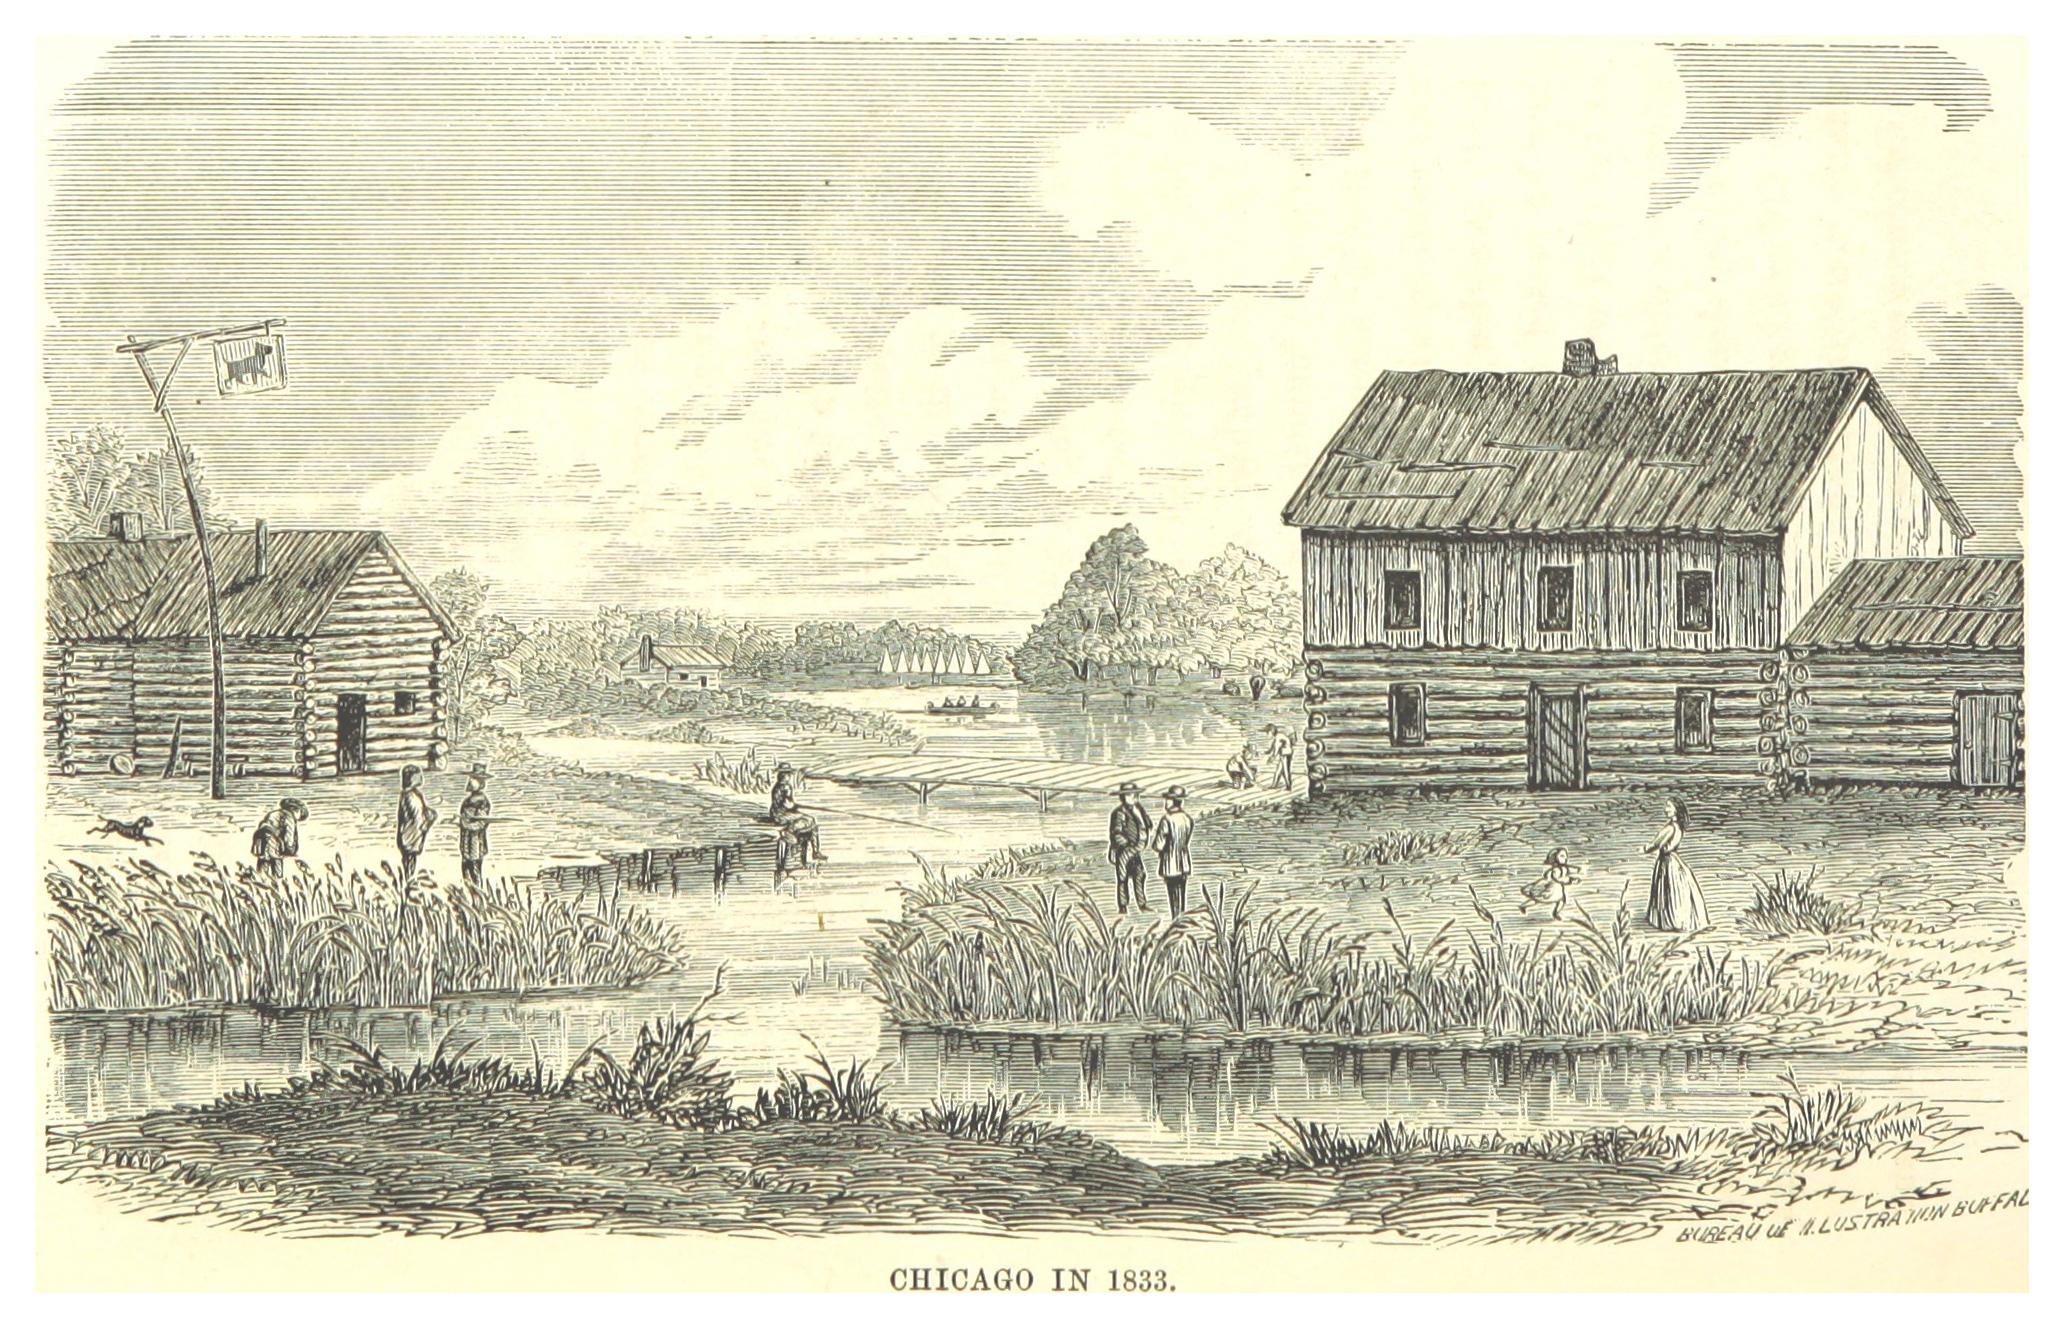 File:COLBERT(1871) p037 CHICAGO IN 1833.jpg